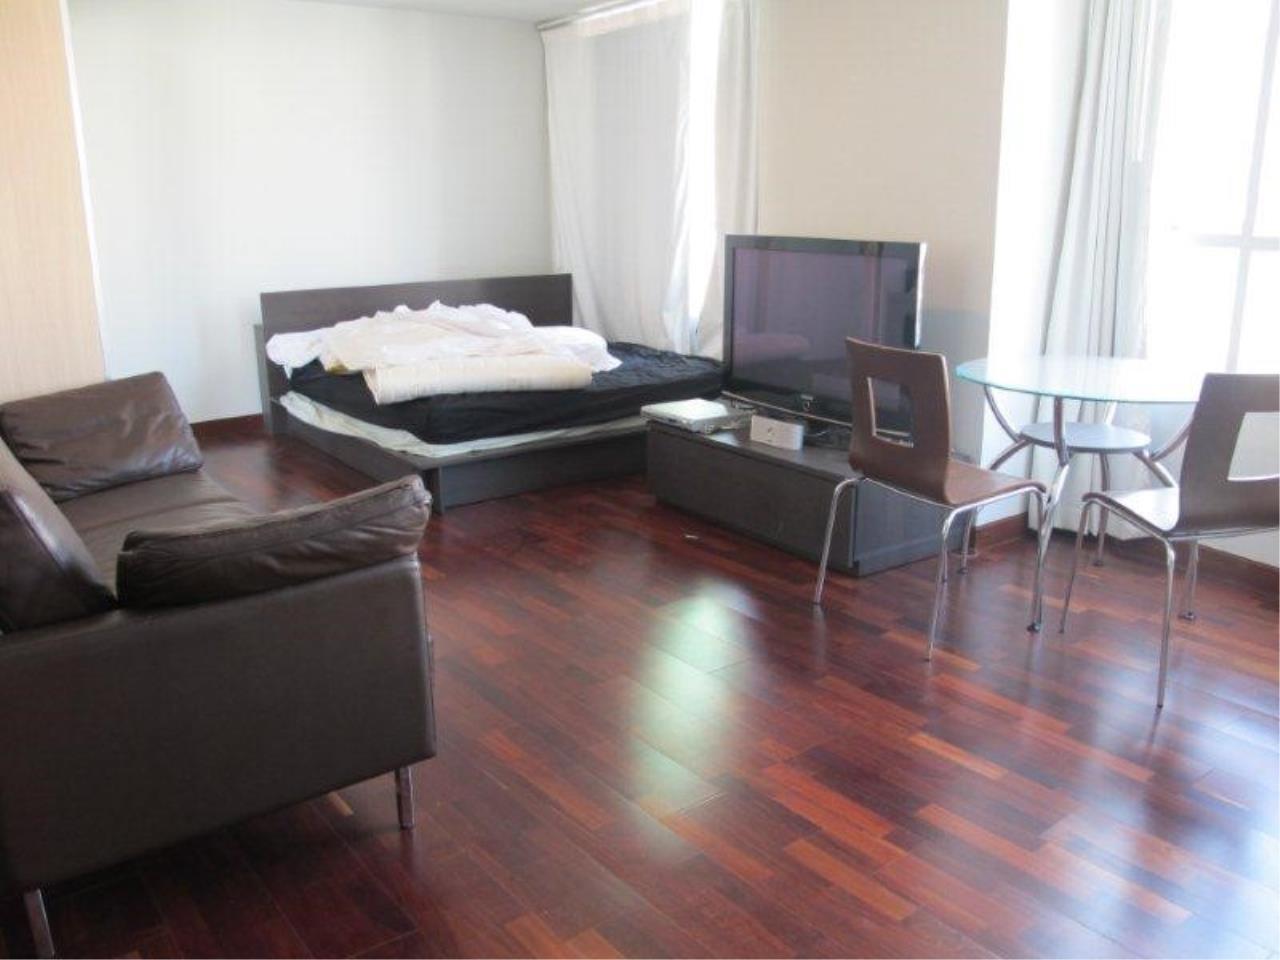 Piri Property Agency's studio bedrooms CondominiumFor Rent 2